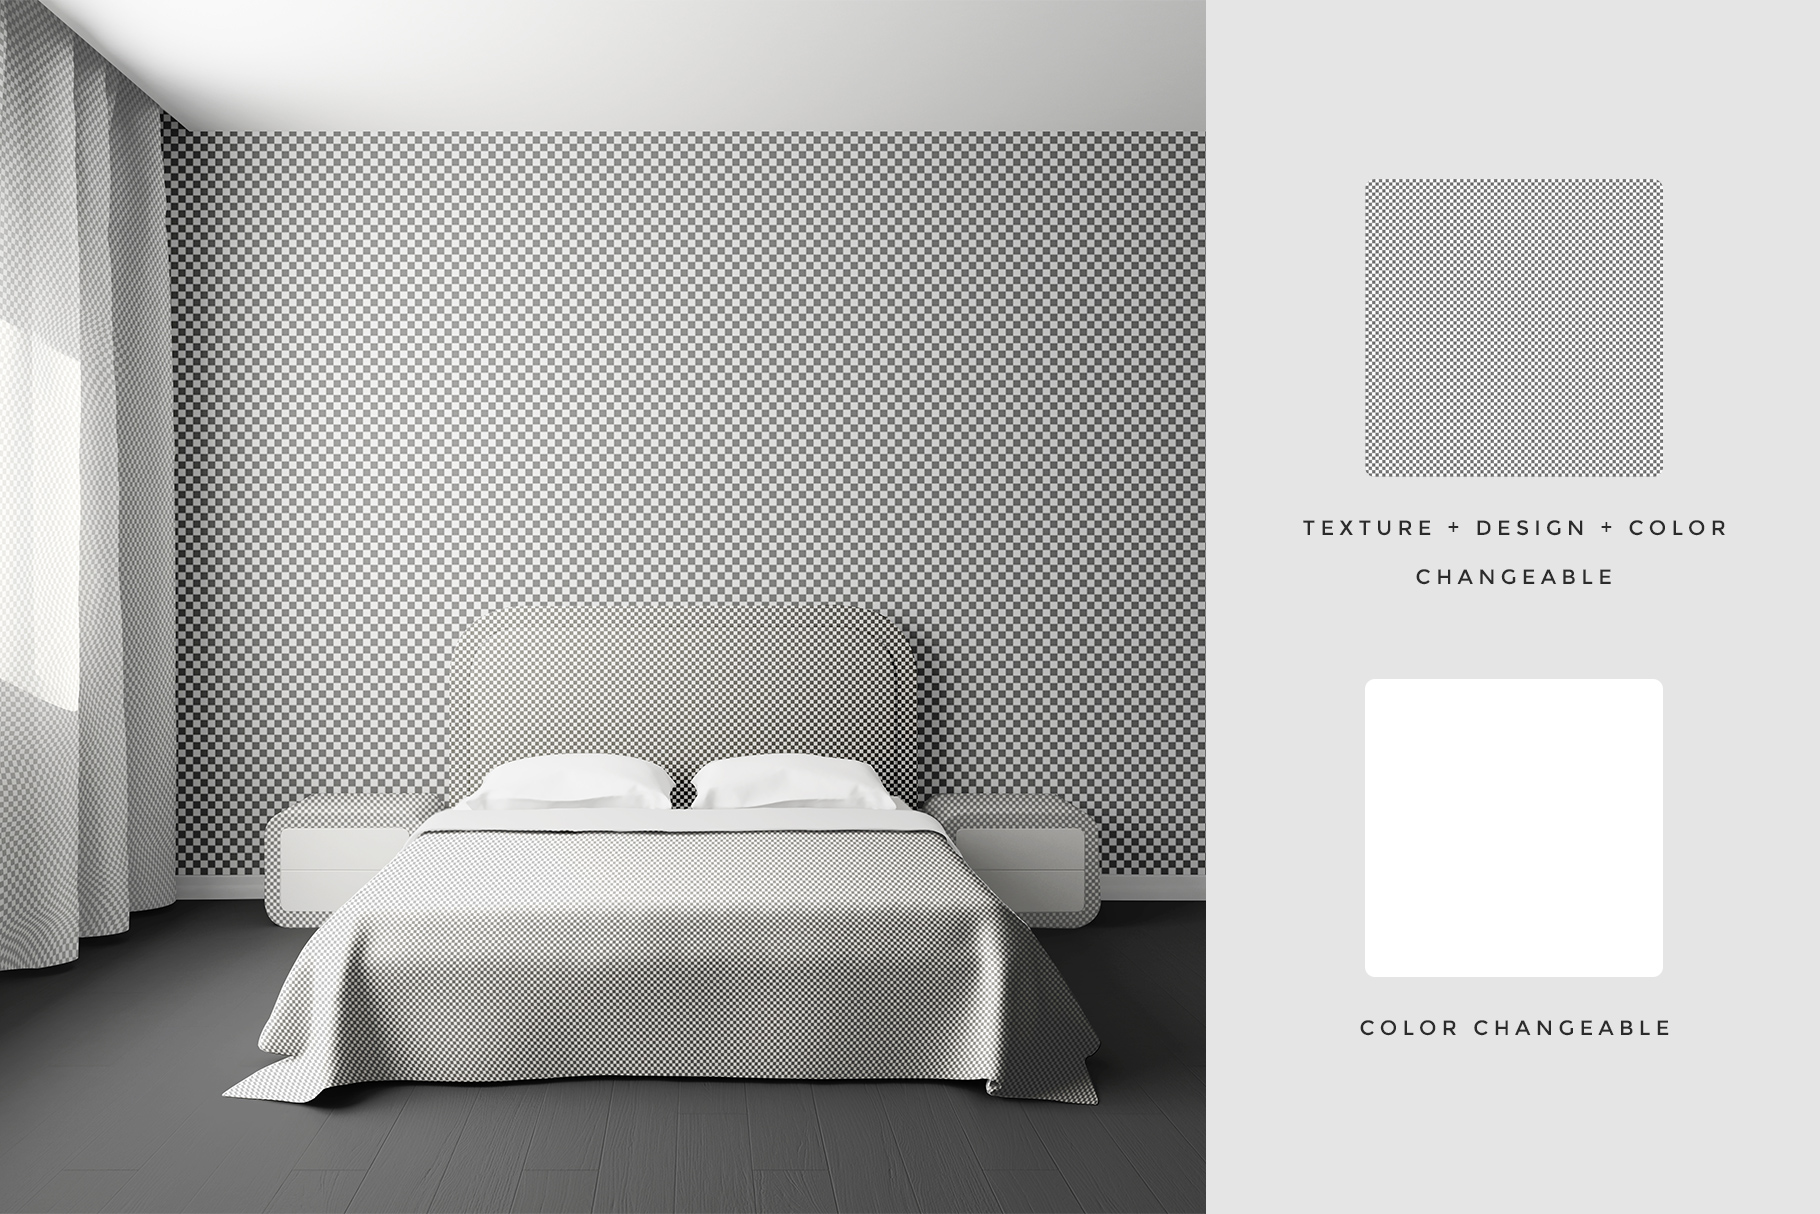 editability options of the bedroom interior mockup